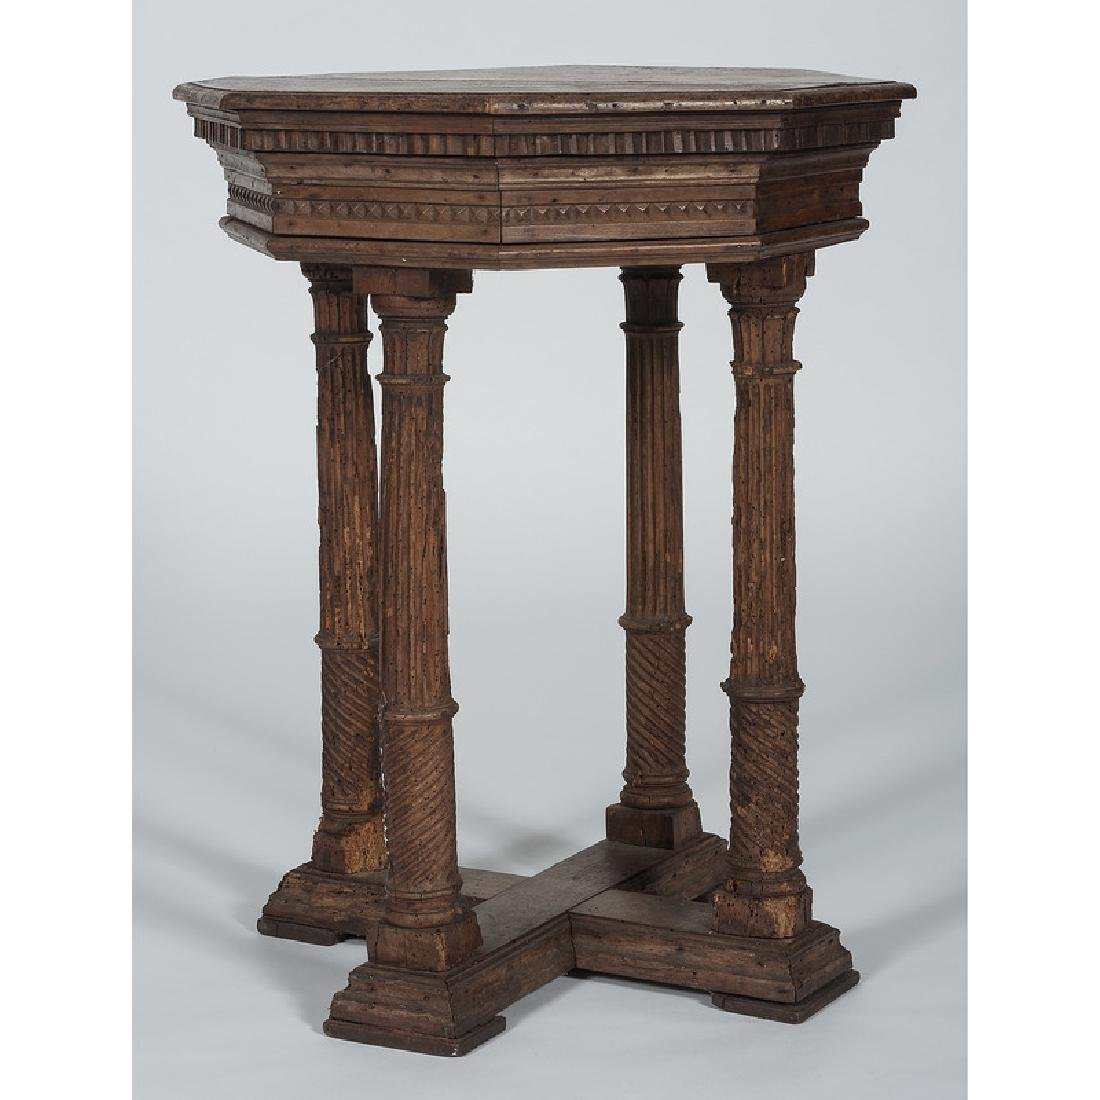 Italian Renaissance-style Octagonal Side Table - 2